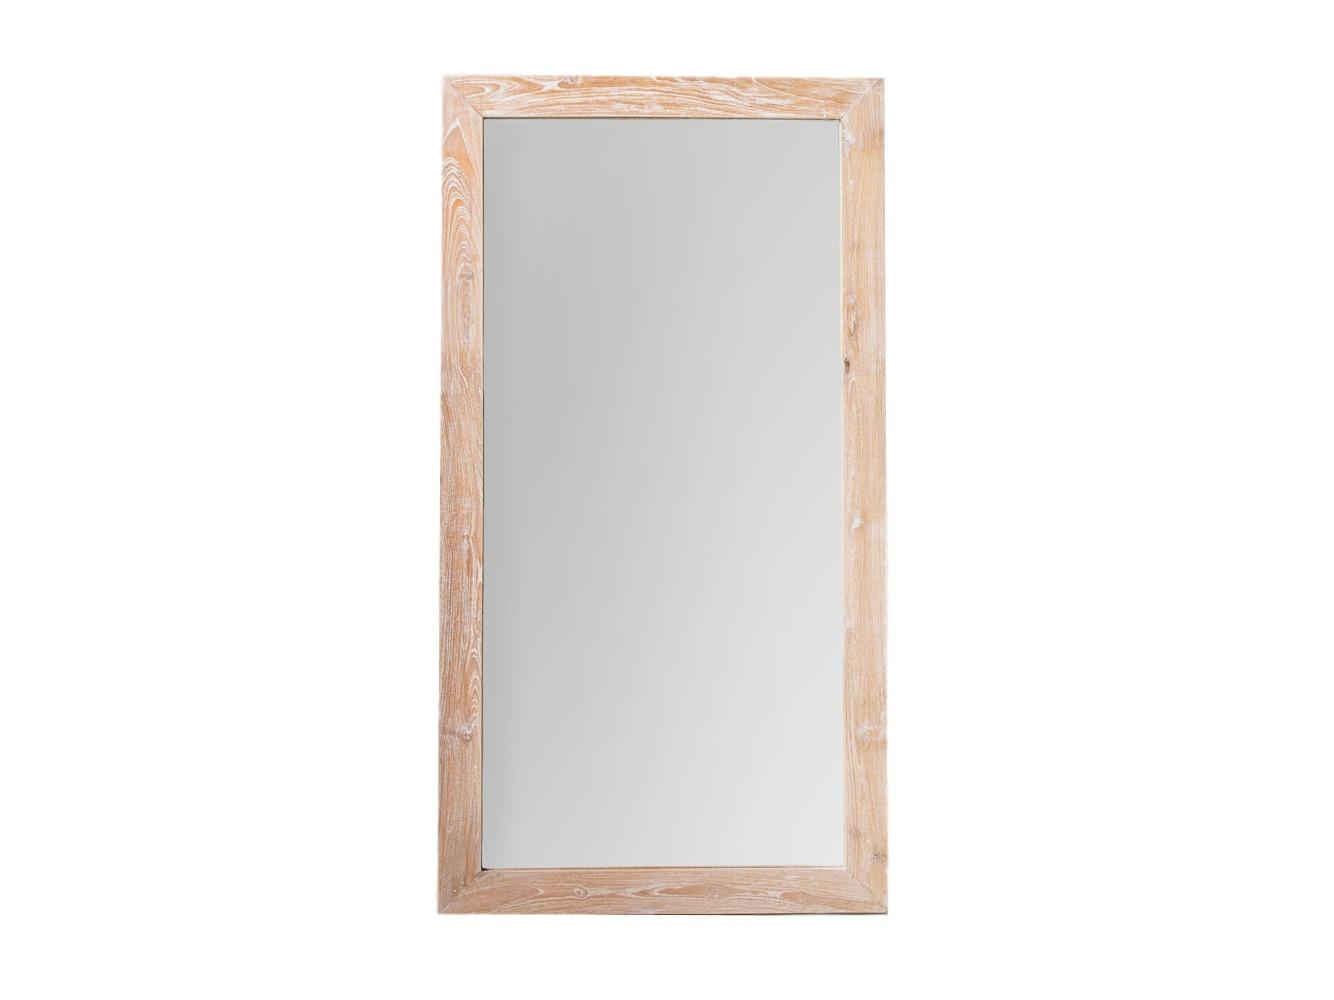 ЗеркалоНастенные зеркала<br><br><br>Material: Тик<br>Ширина см: 70<br>Высота см: 130<br>Глубина см: 3